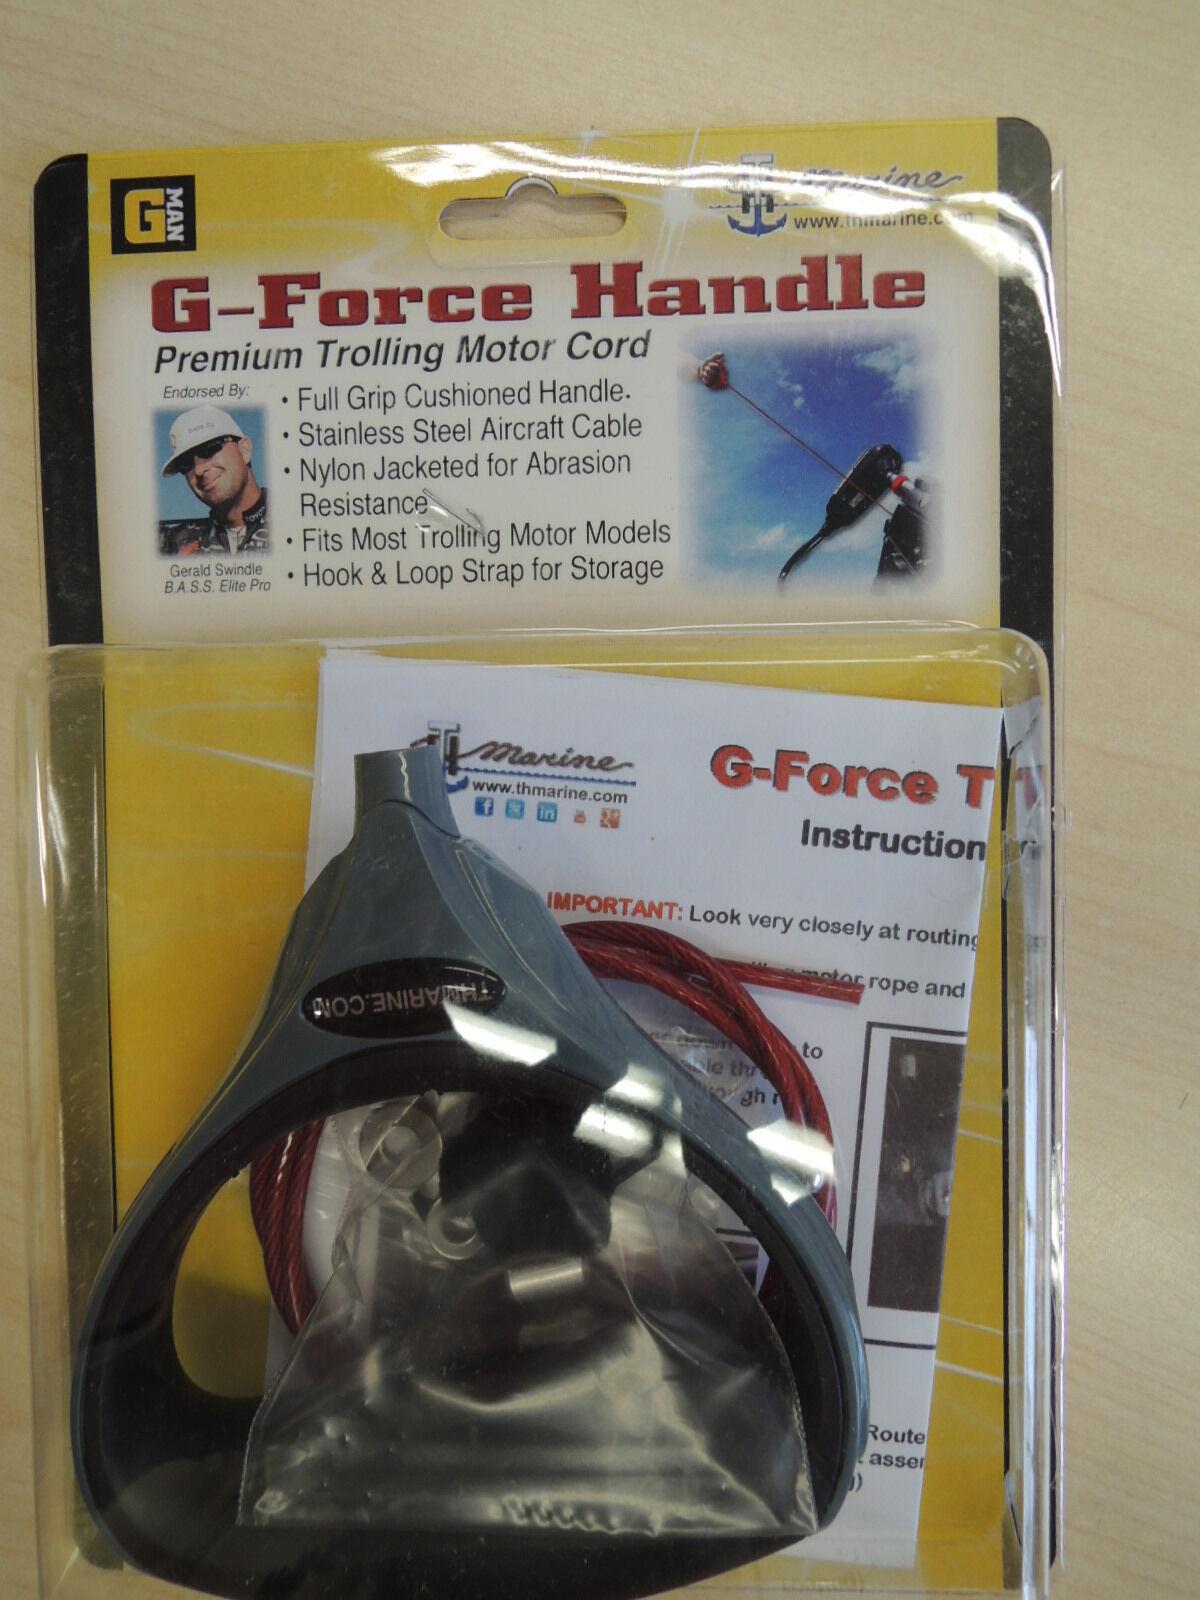 G Force Handle by TH Marine Minn Kota Motorguide trolling motor accessory